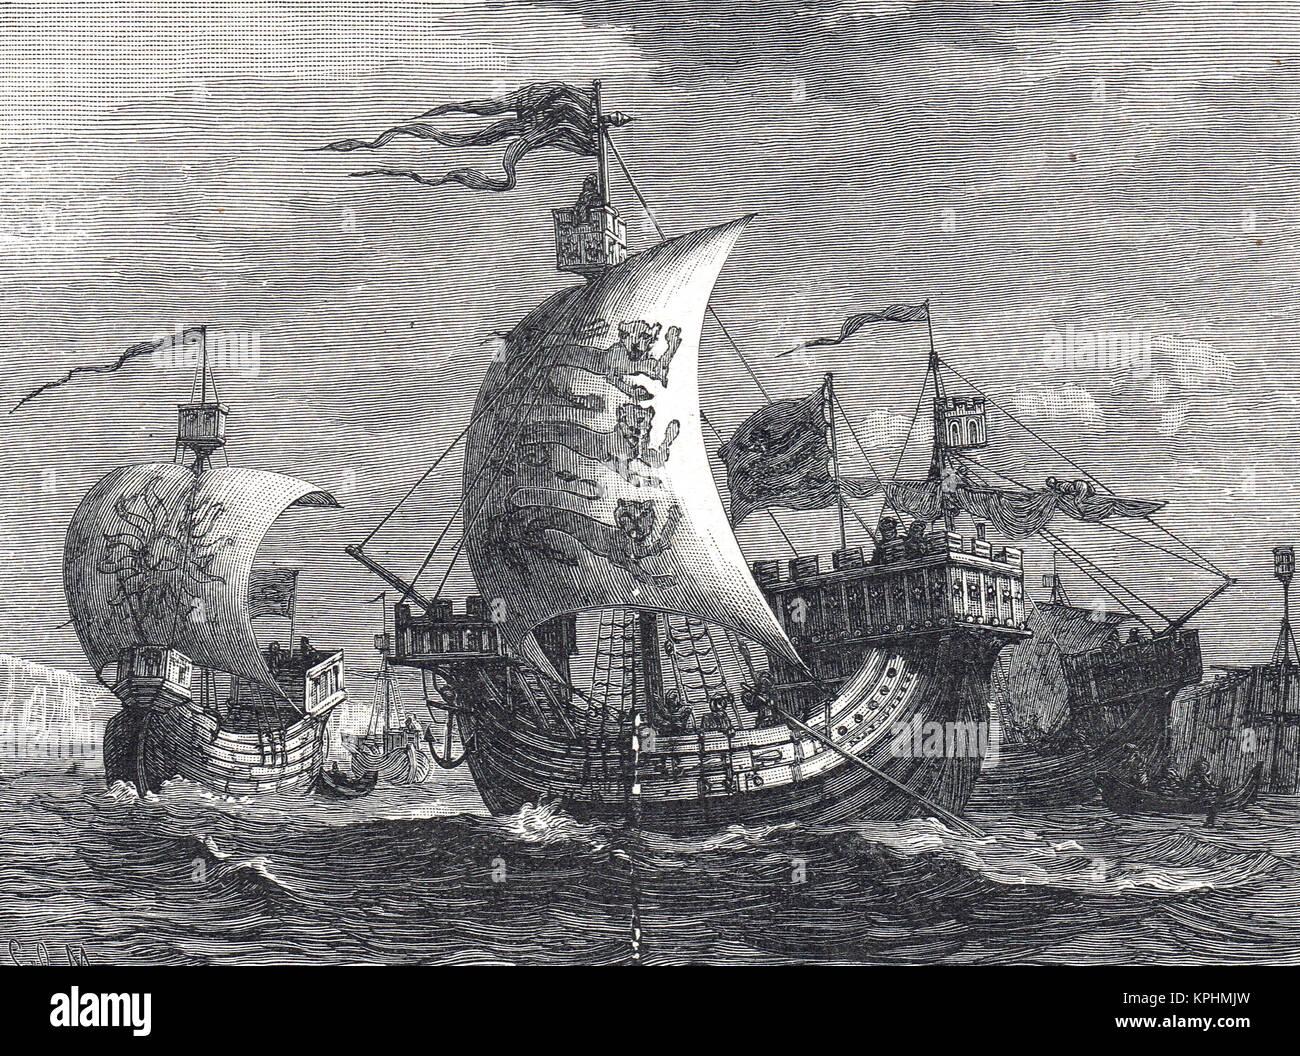 English ships of the Fourteenth century - Stock Image